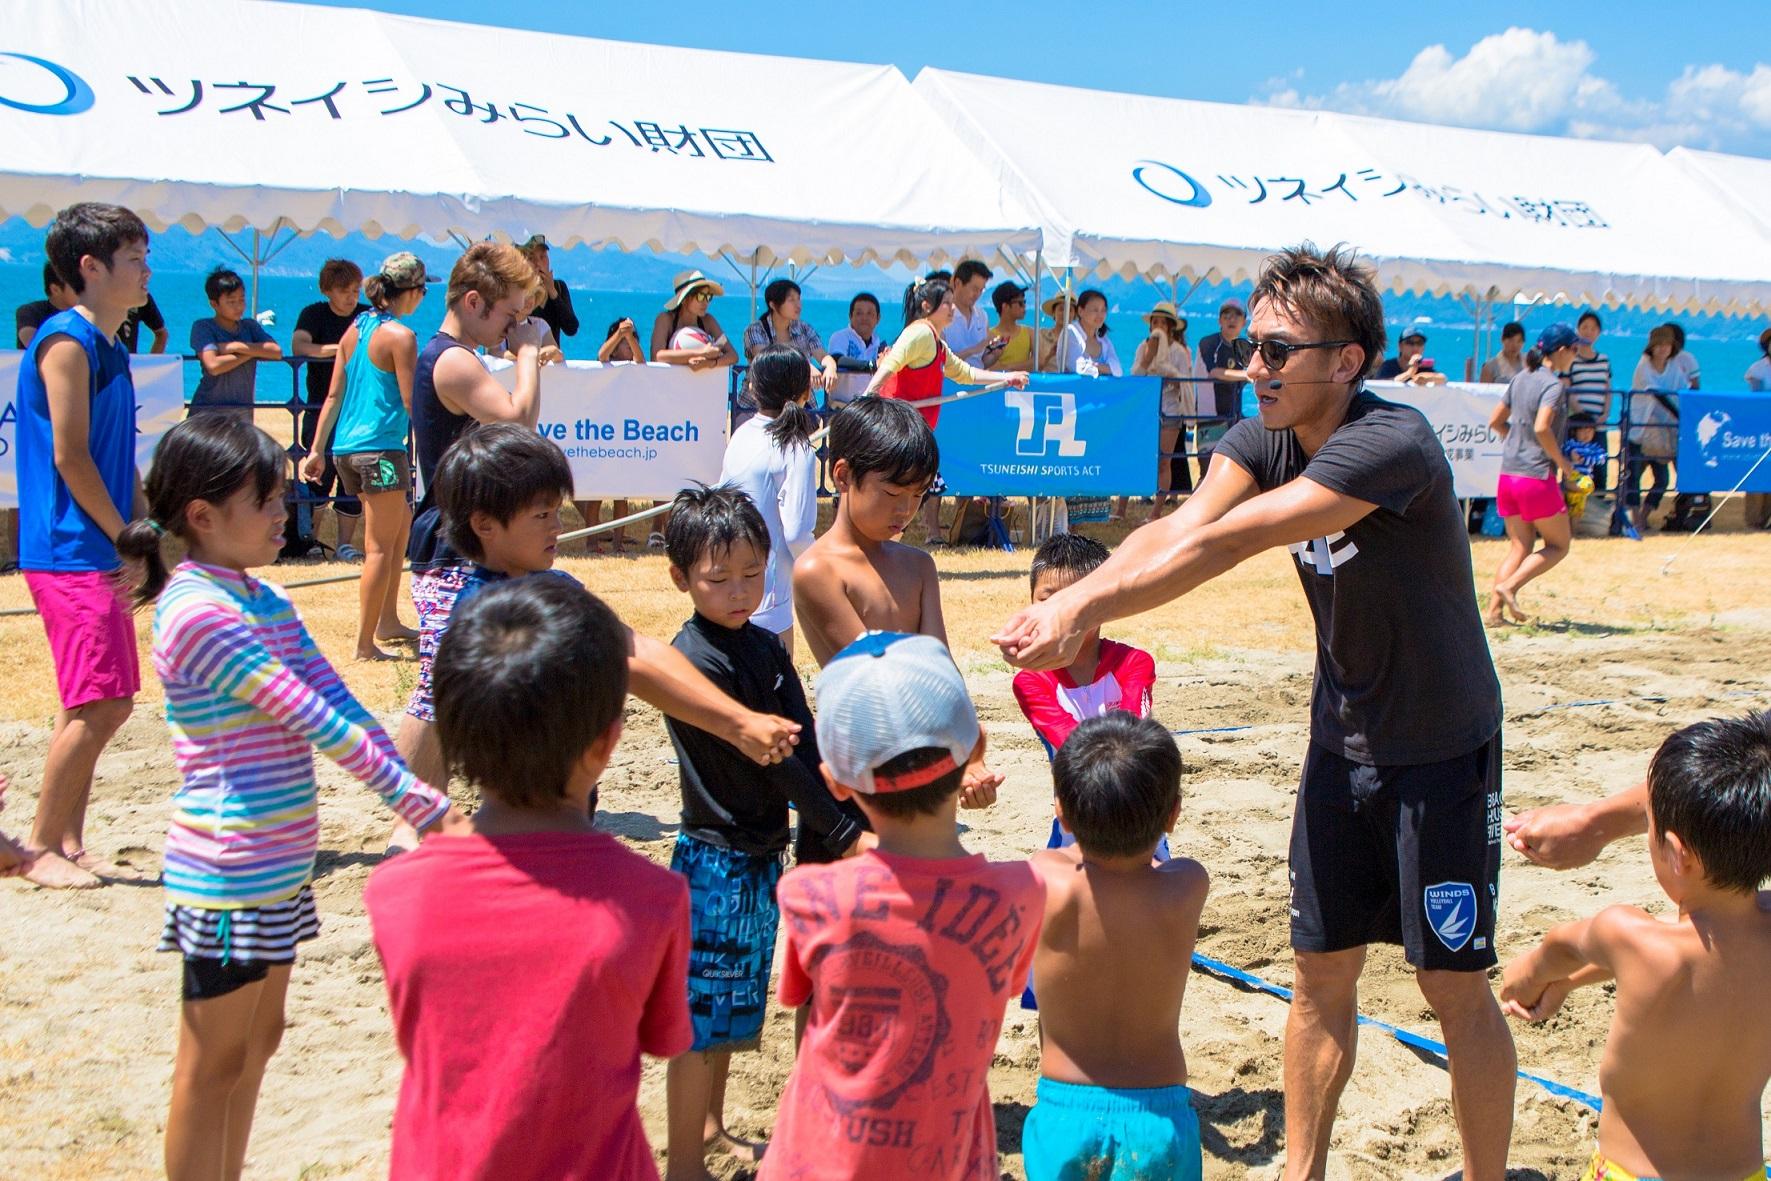 Save the Beach 2016 in シーパーク大浜が開催~青空の下でビーチバレーを満喫~